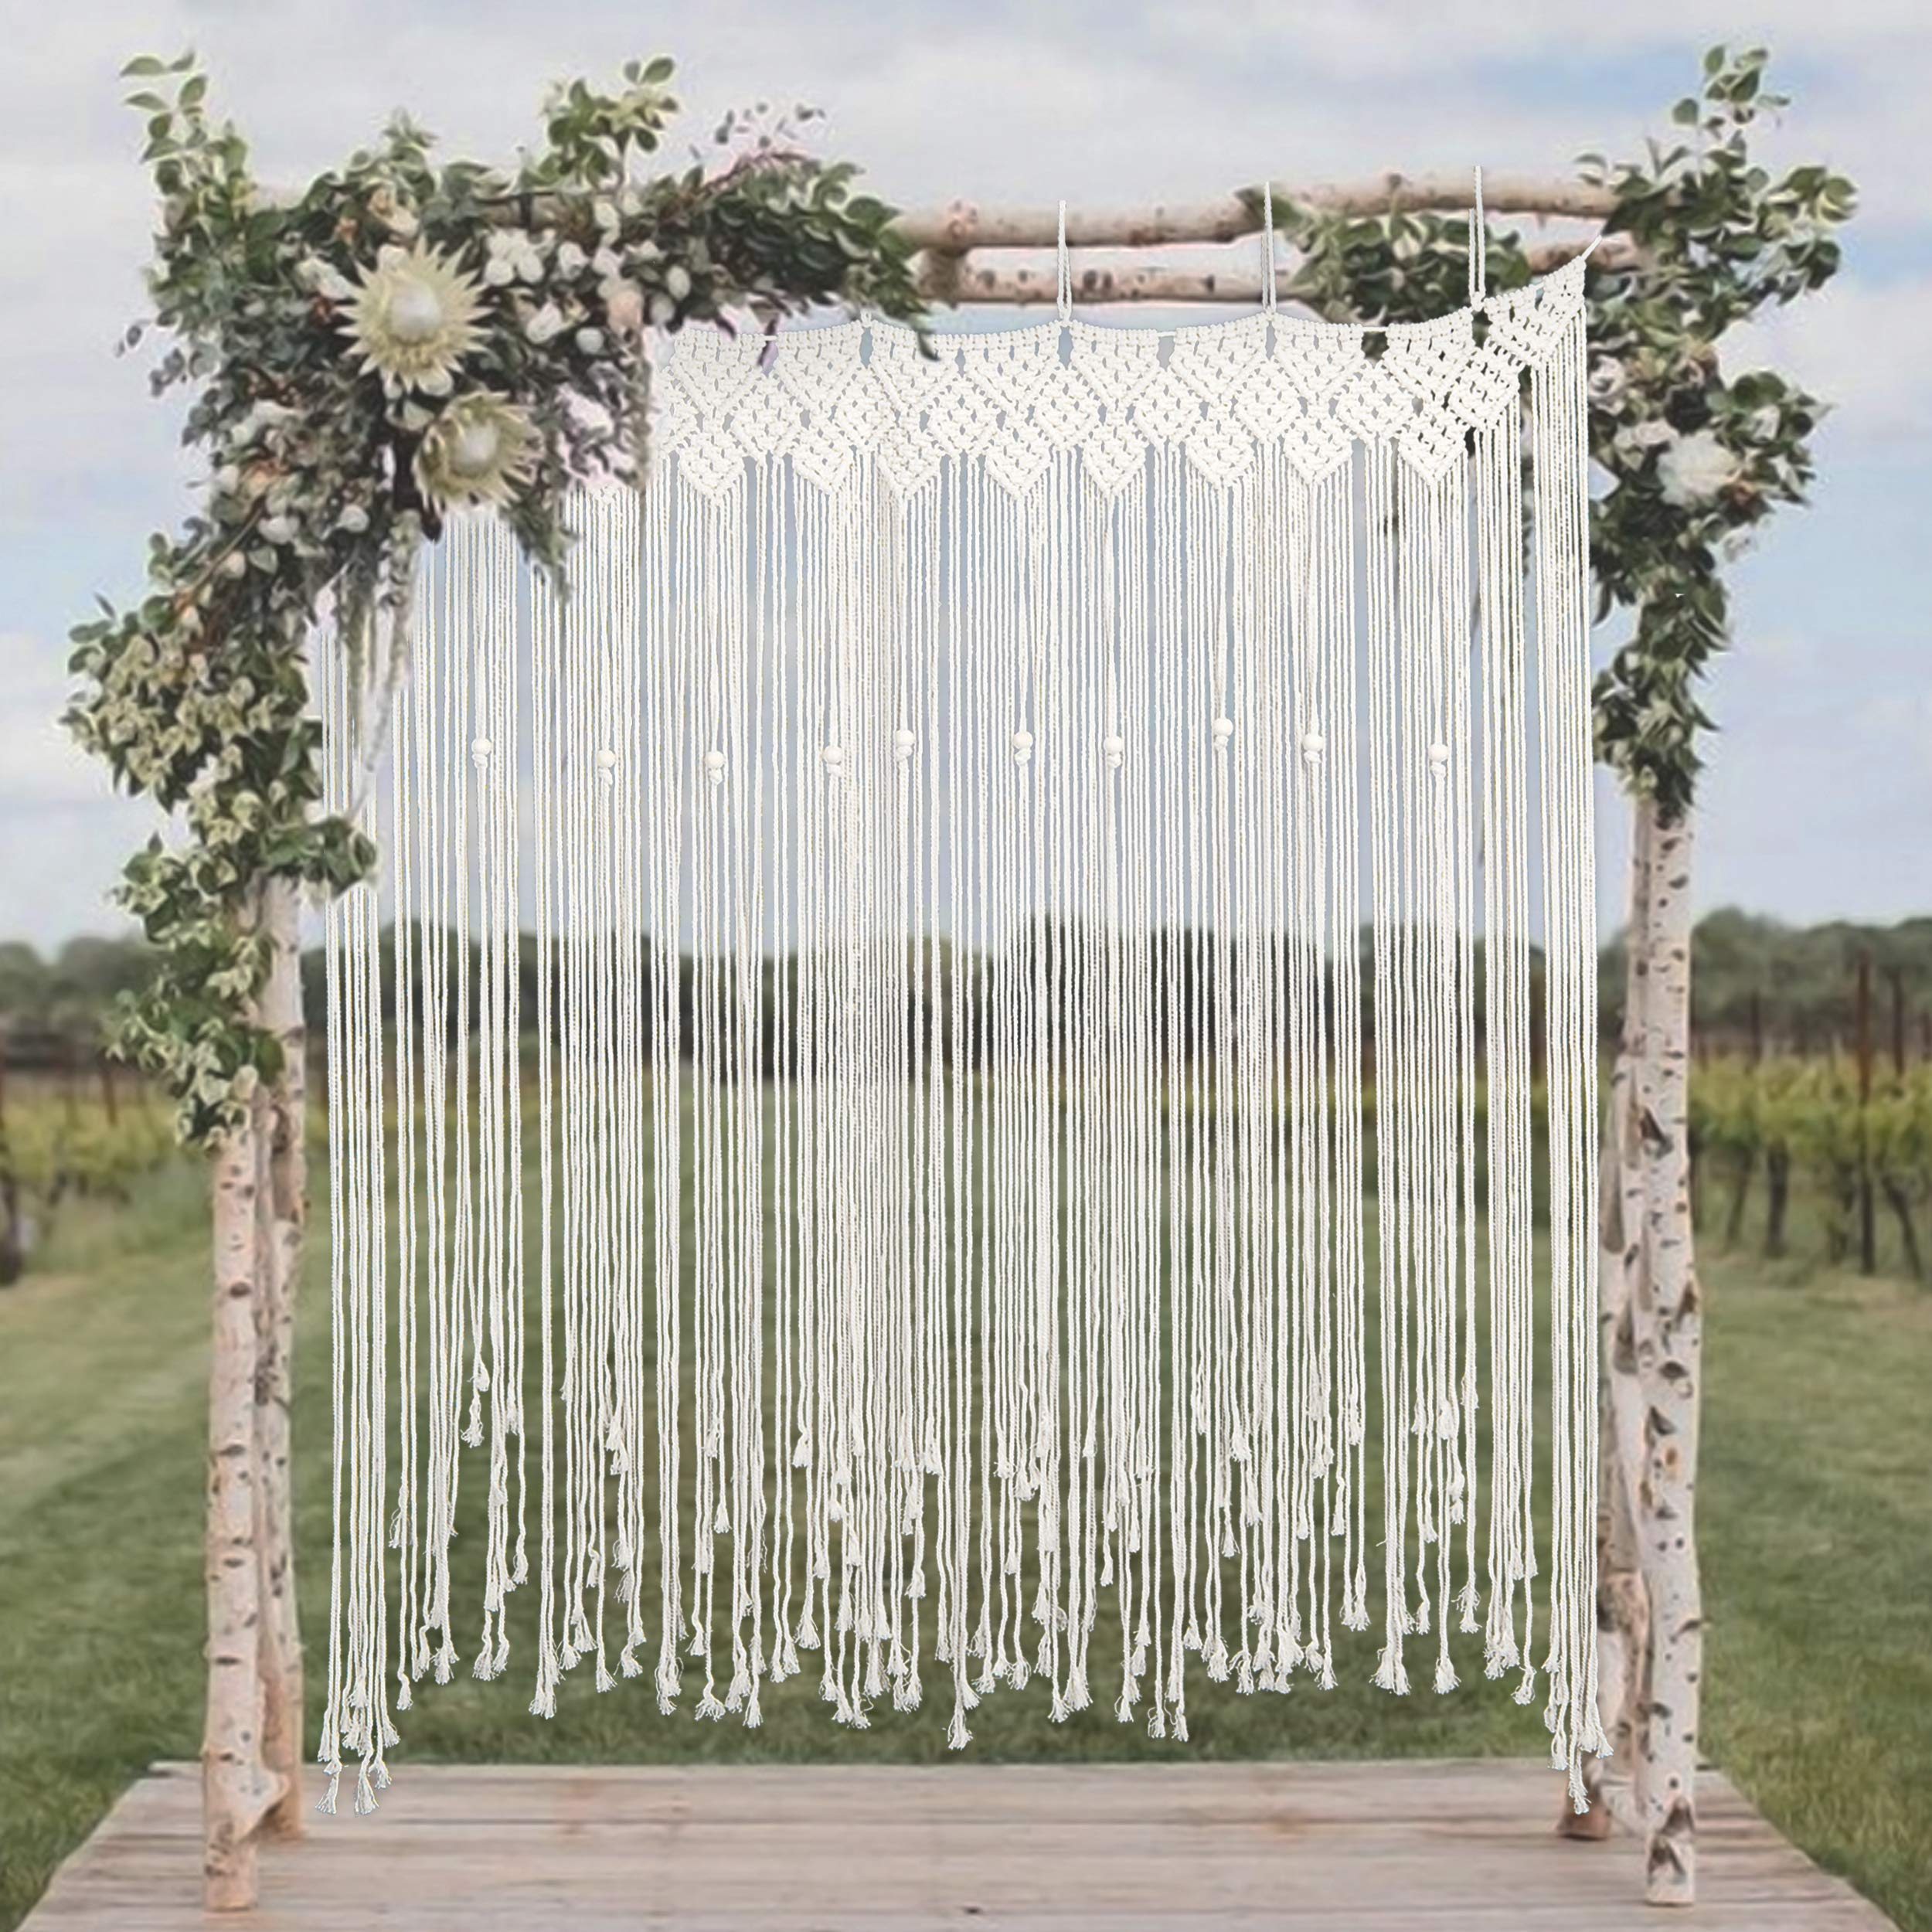 Willtos Large Macrame Backdrop - Boho Style Macrame Wedding Backdrop for Ceremony and Reception - 57'' W x 70'' L by Willtos